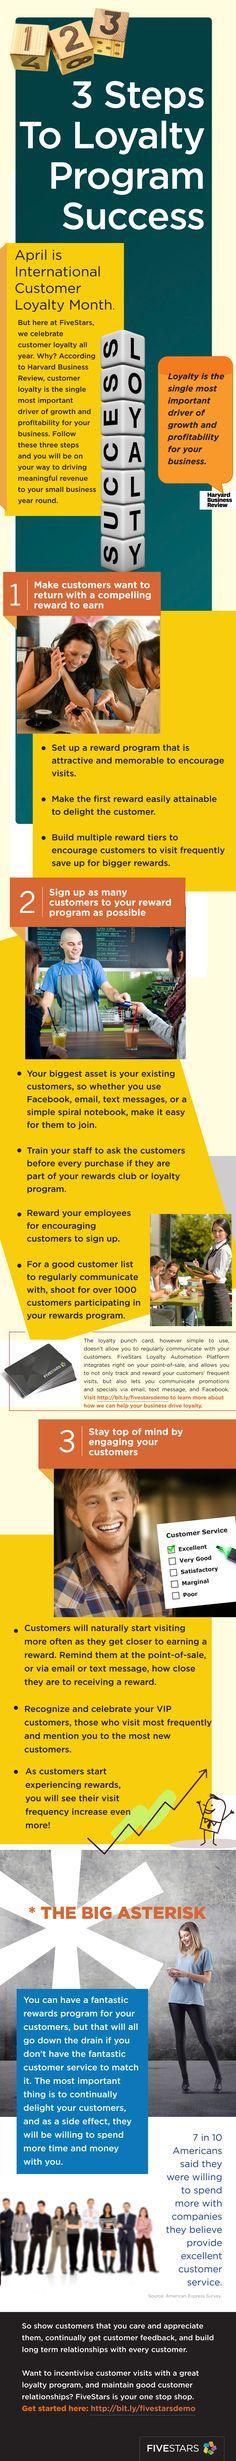 3 Steps To Customer Loyalty Program Success - @FiveStars Blog #infographic